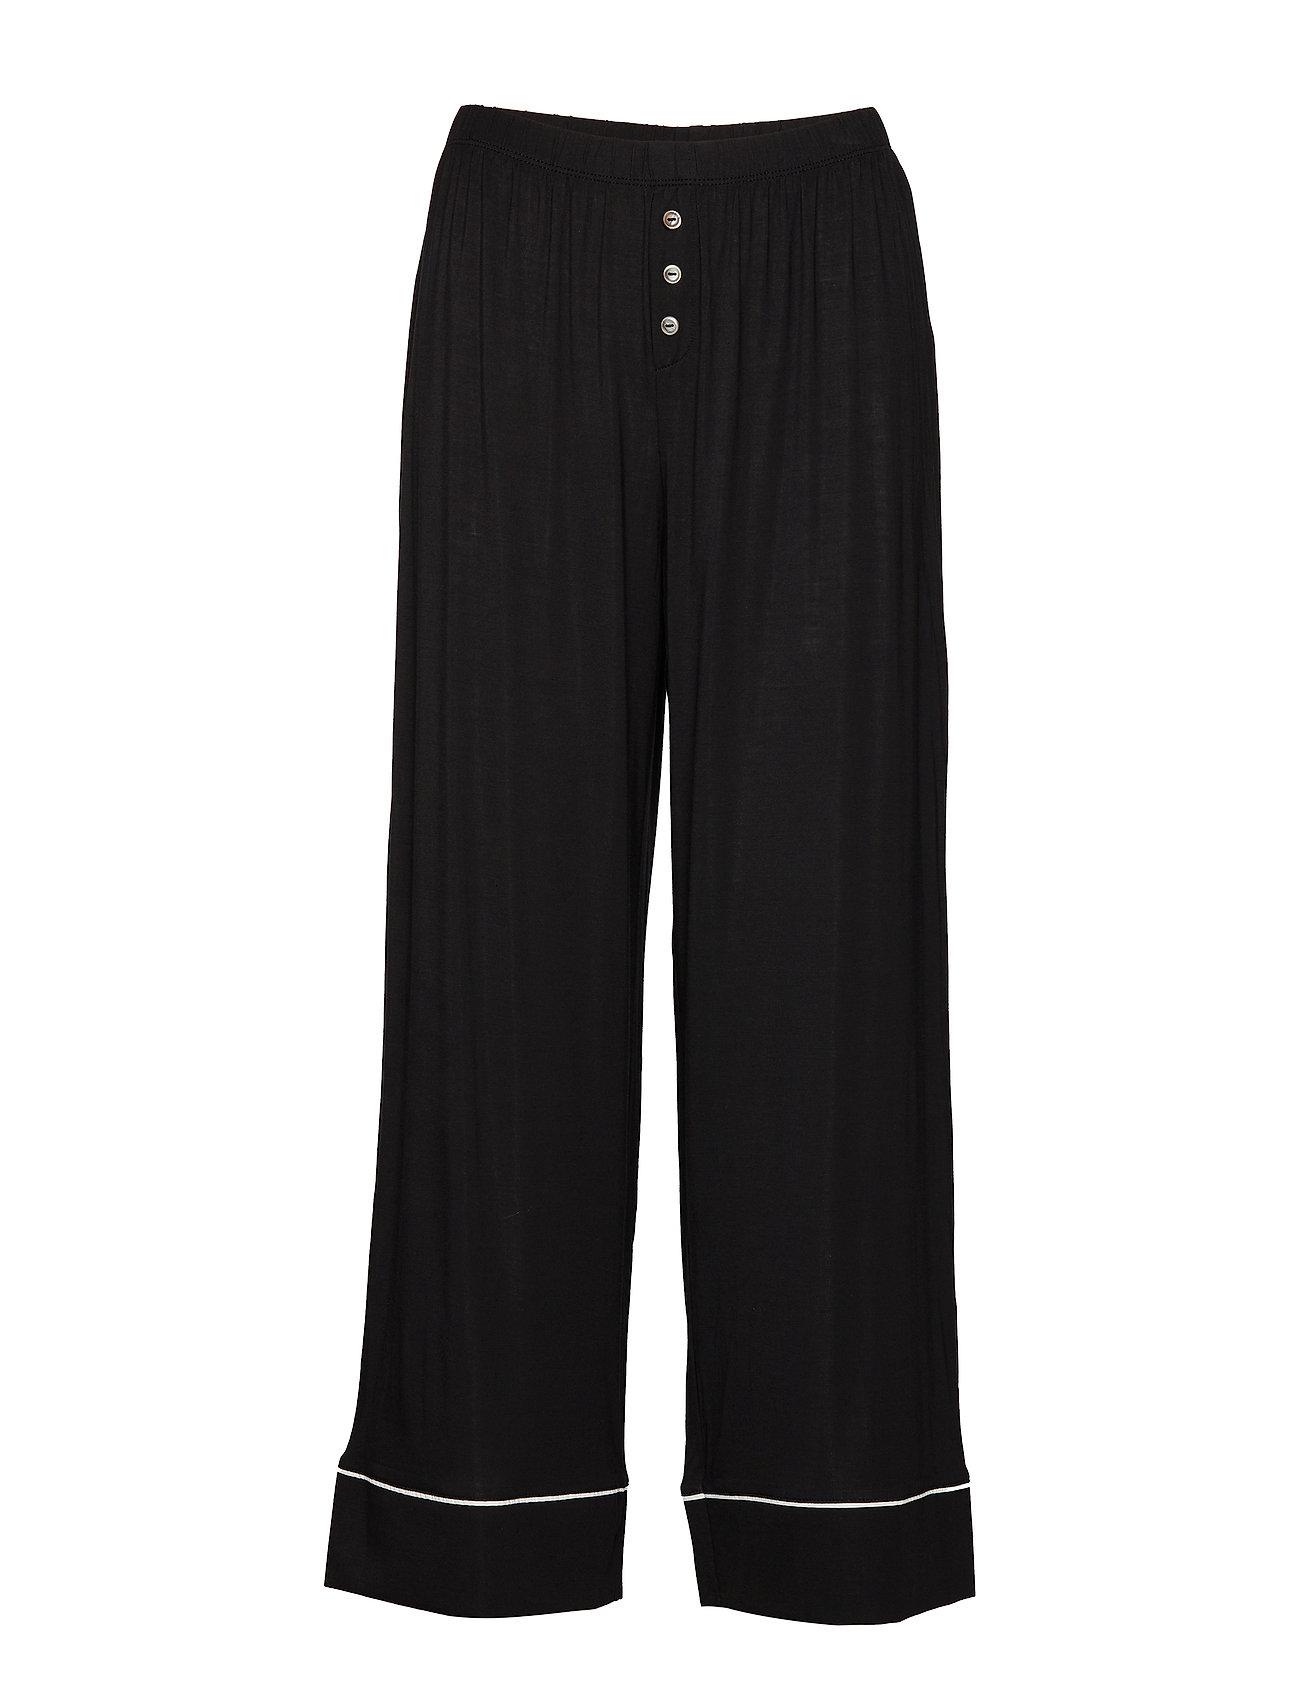 GAP Ankle Flare Pants in Modal - TRUE BLACK